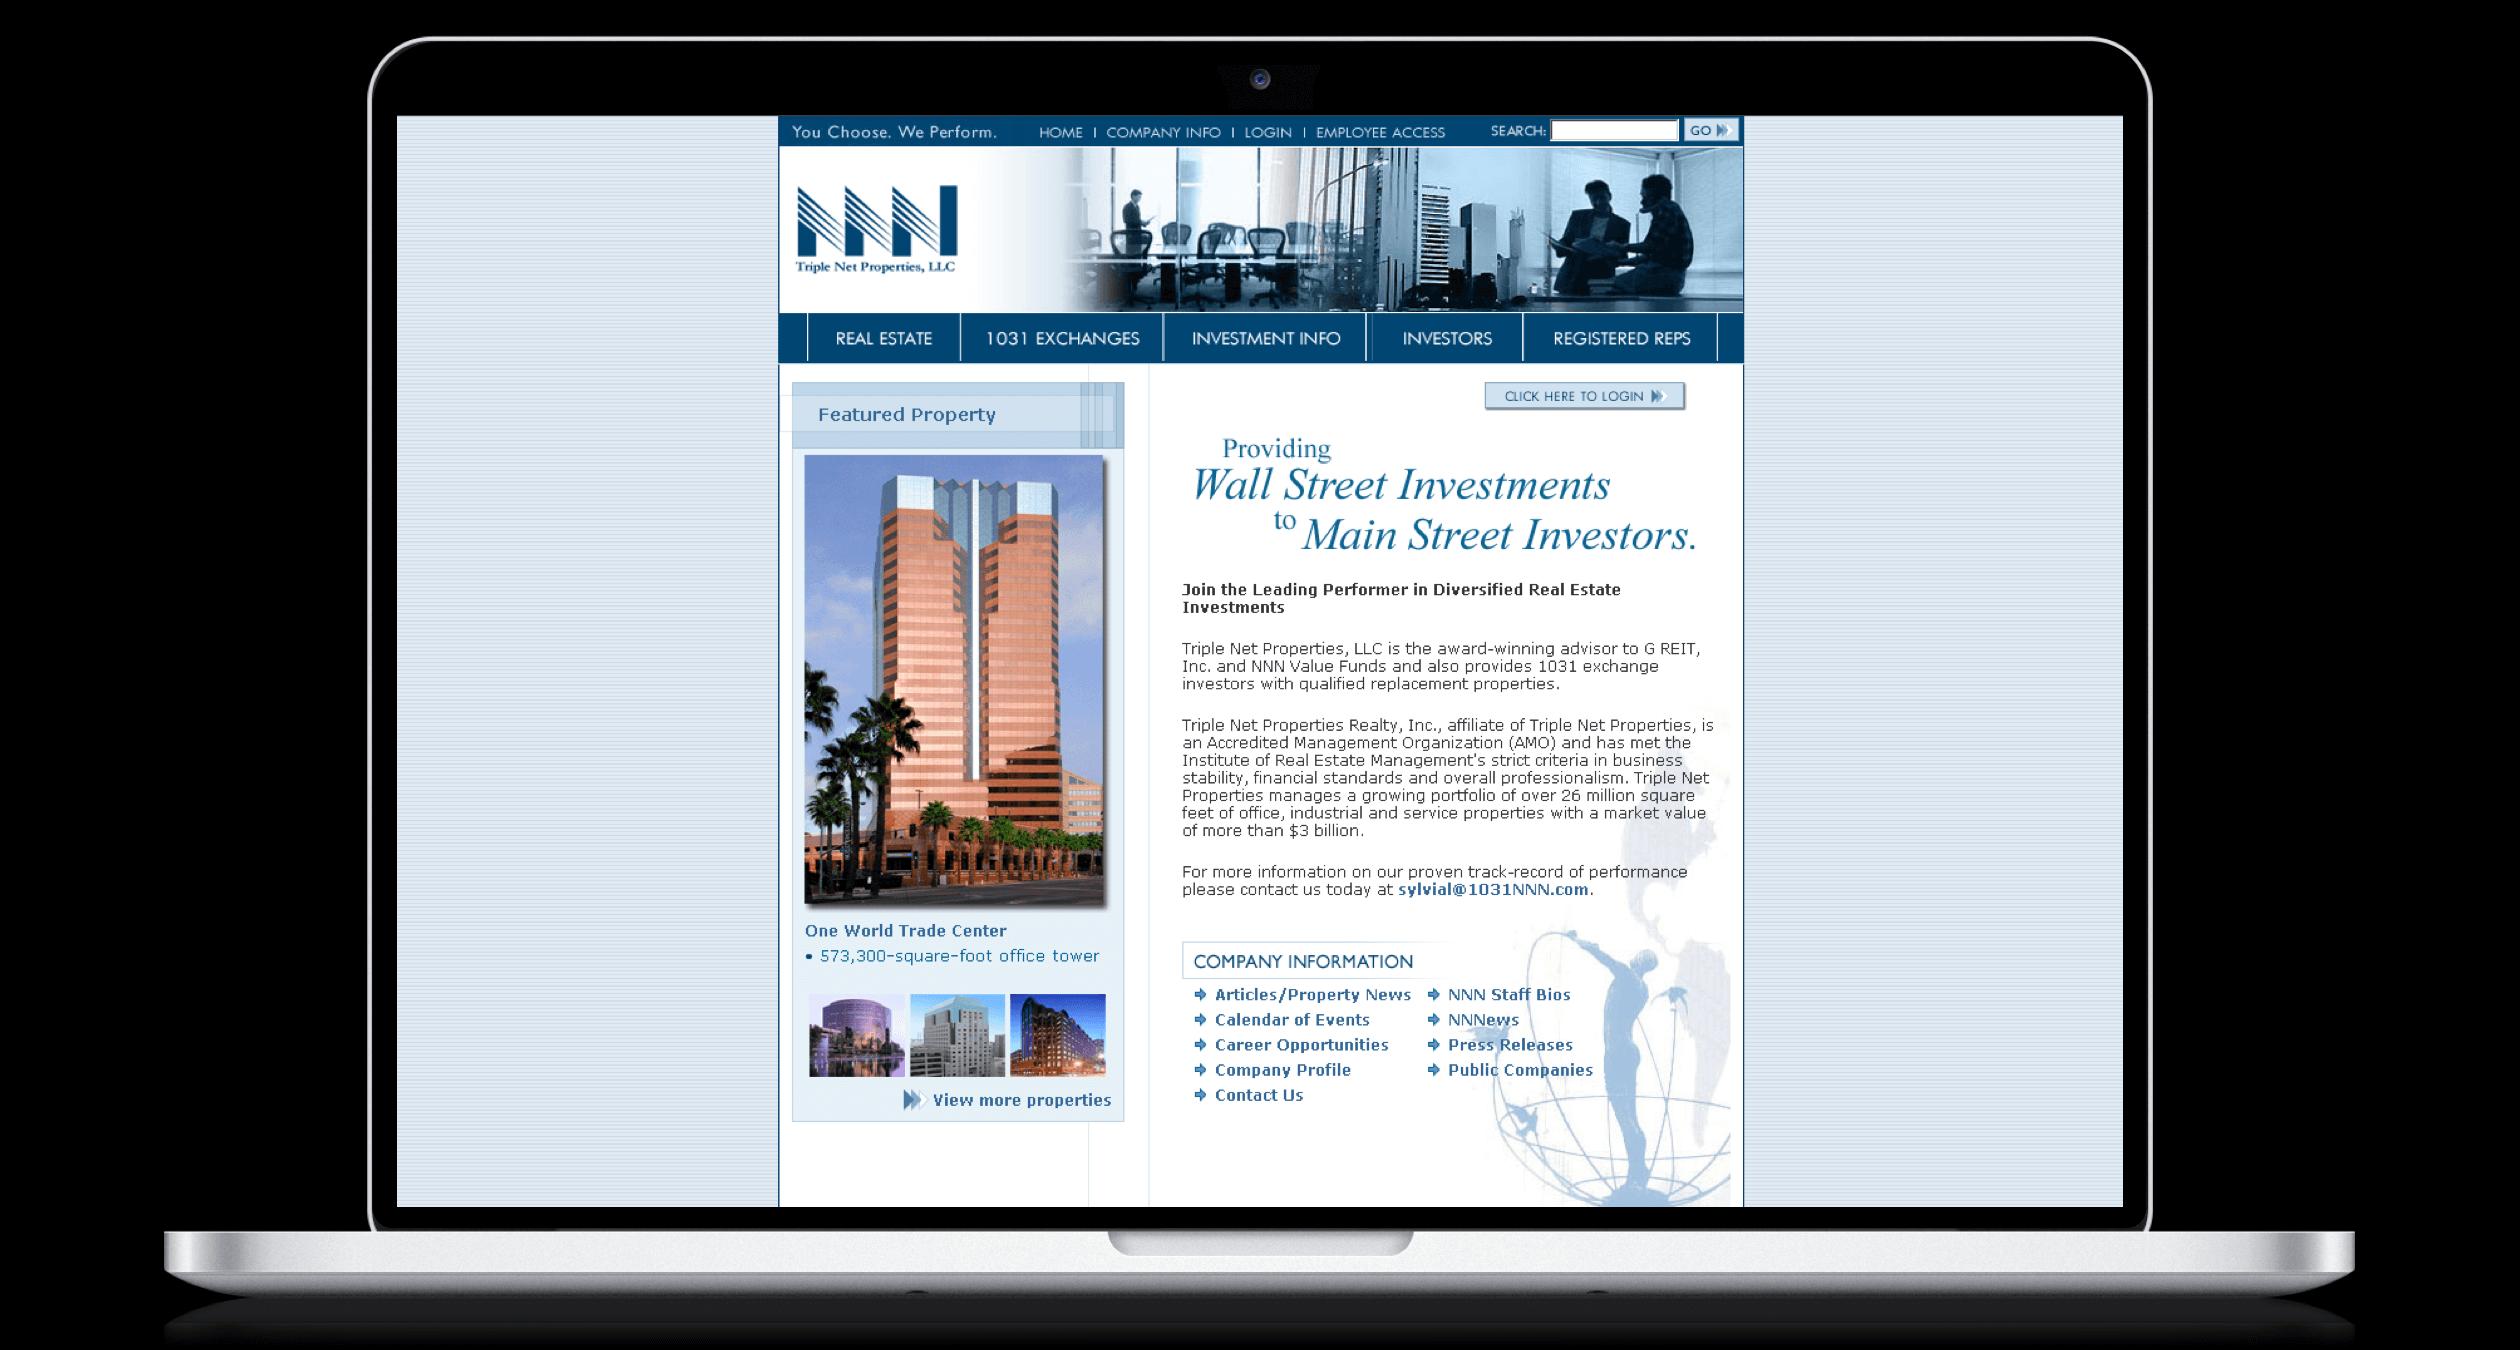 PHX-Web-Agency-Triple-Net-Properties-NNN-Real-Estate-Invetment-Trusts-REITS-1031-Exchange-Website-Design-After